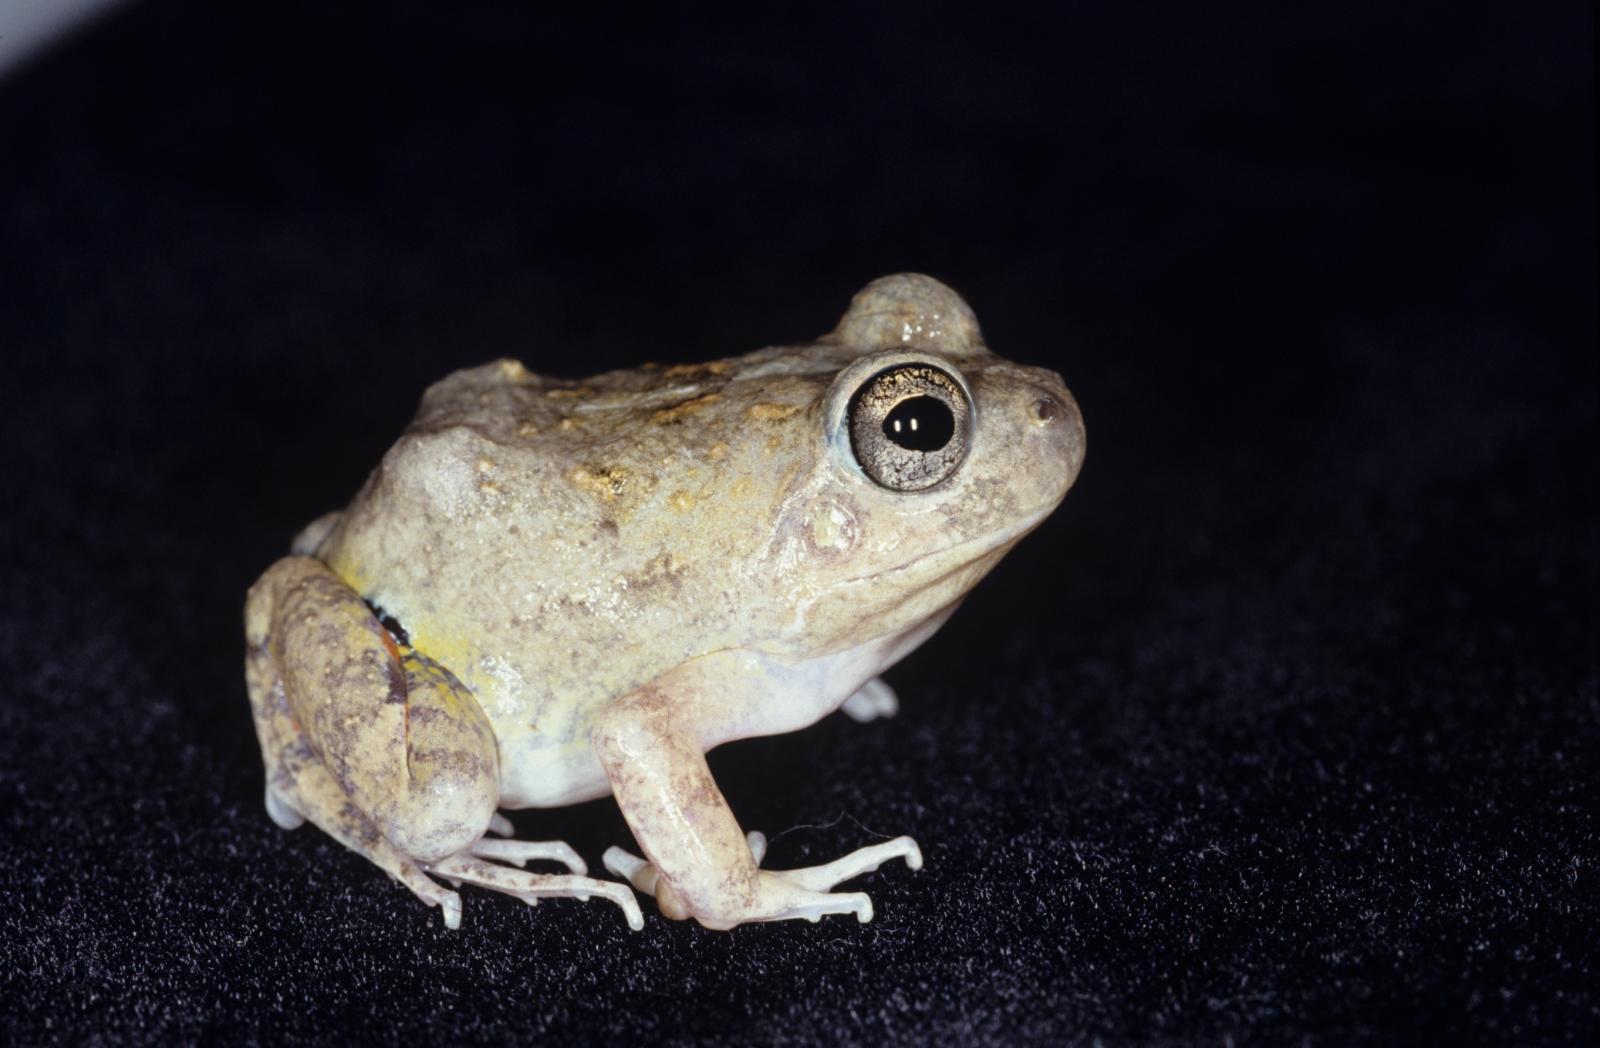 Pleurodema brachyops